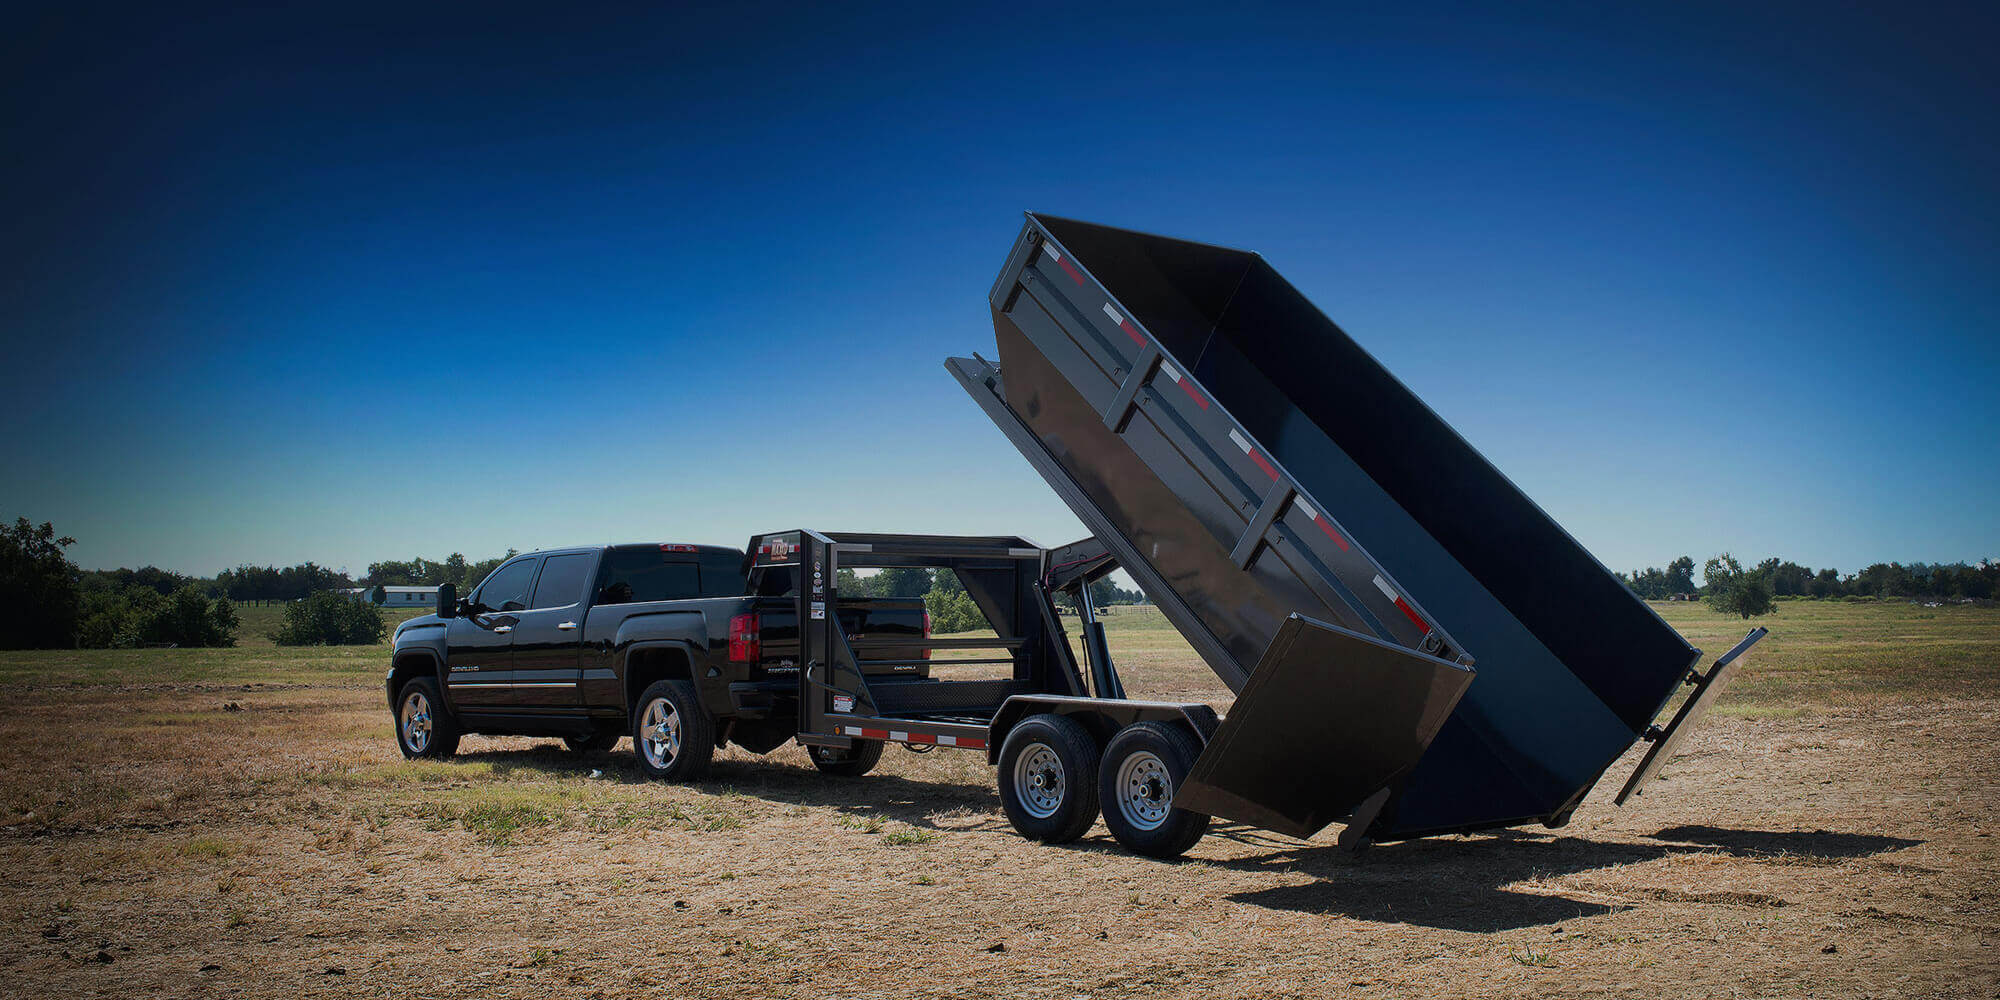 Home Bronco Trailer Lemoore California Utility Flatbed And Skid Steer Trailers On Wiring Lights Repair Roll Off Dump